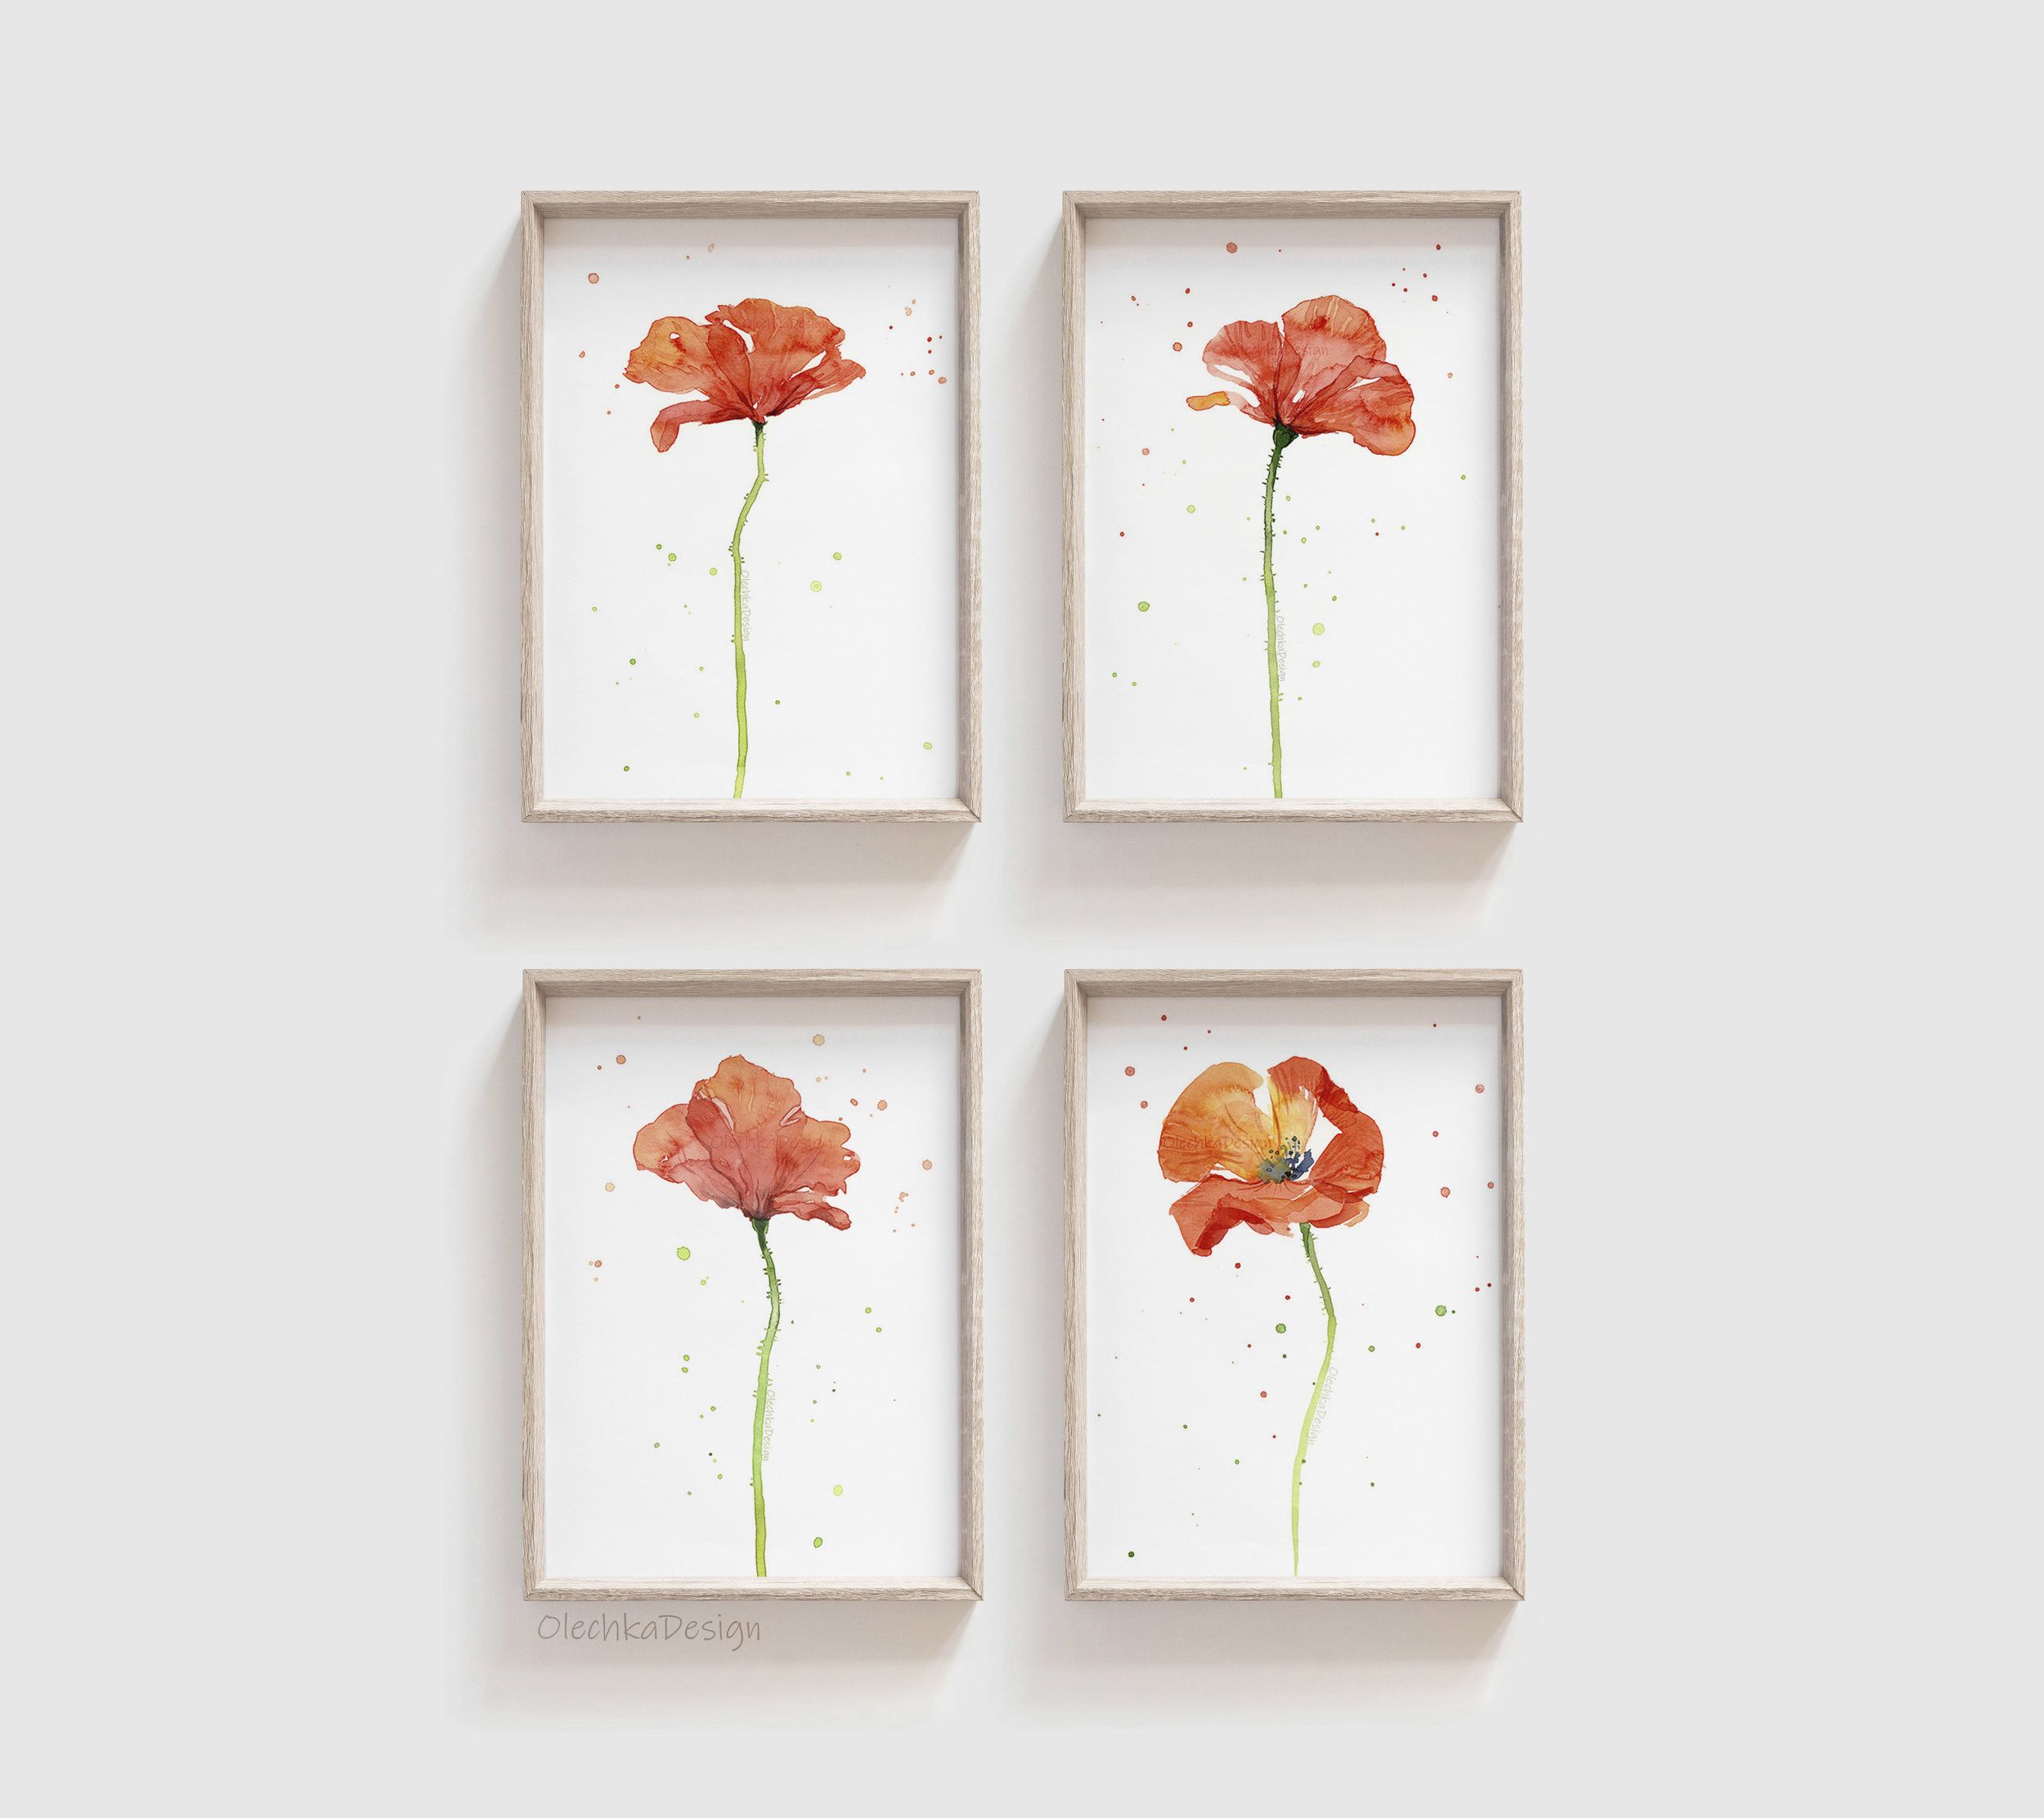 poppy-watercolor-prints-set-of-4-prints.jpg